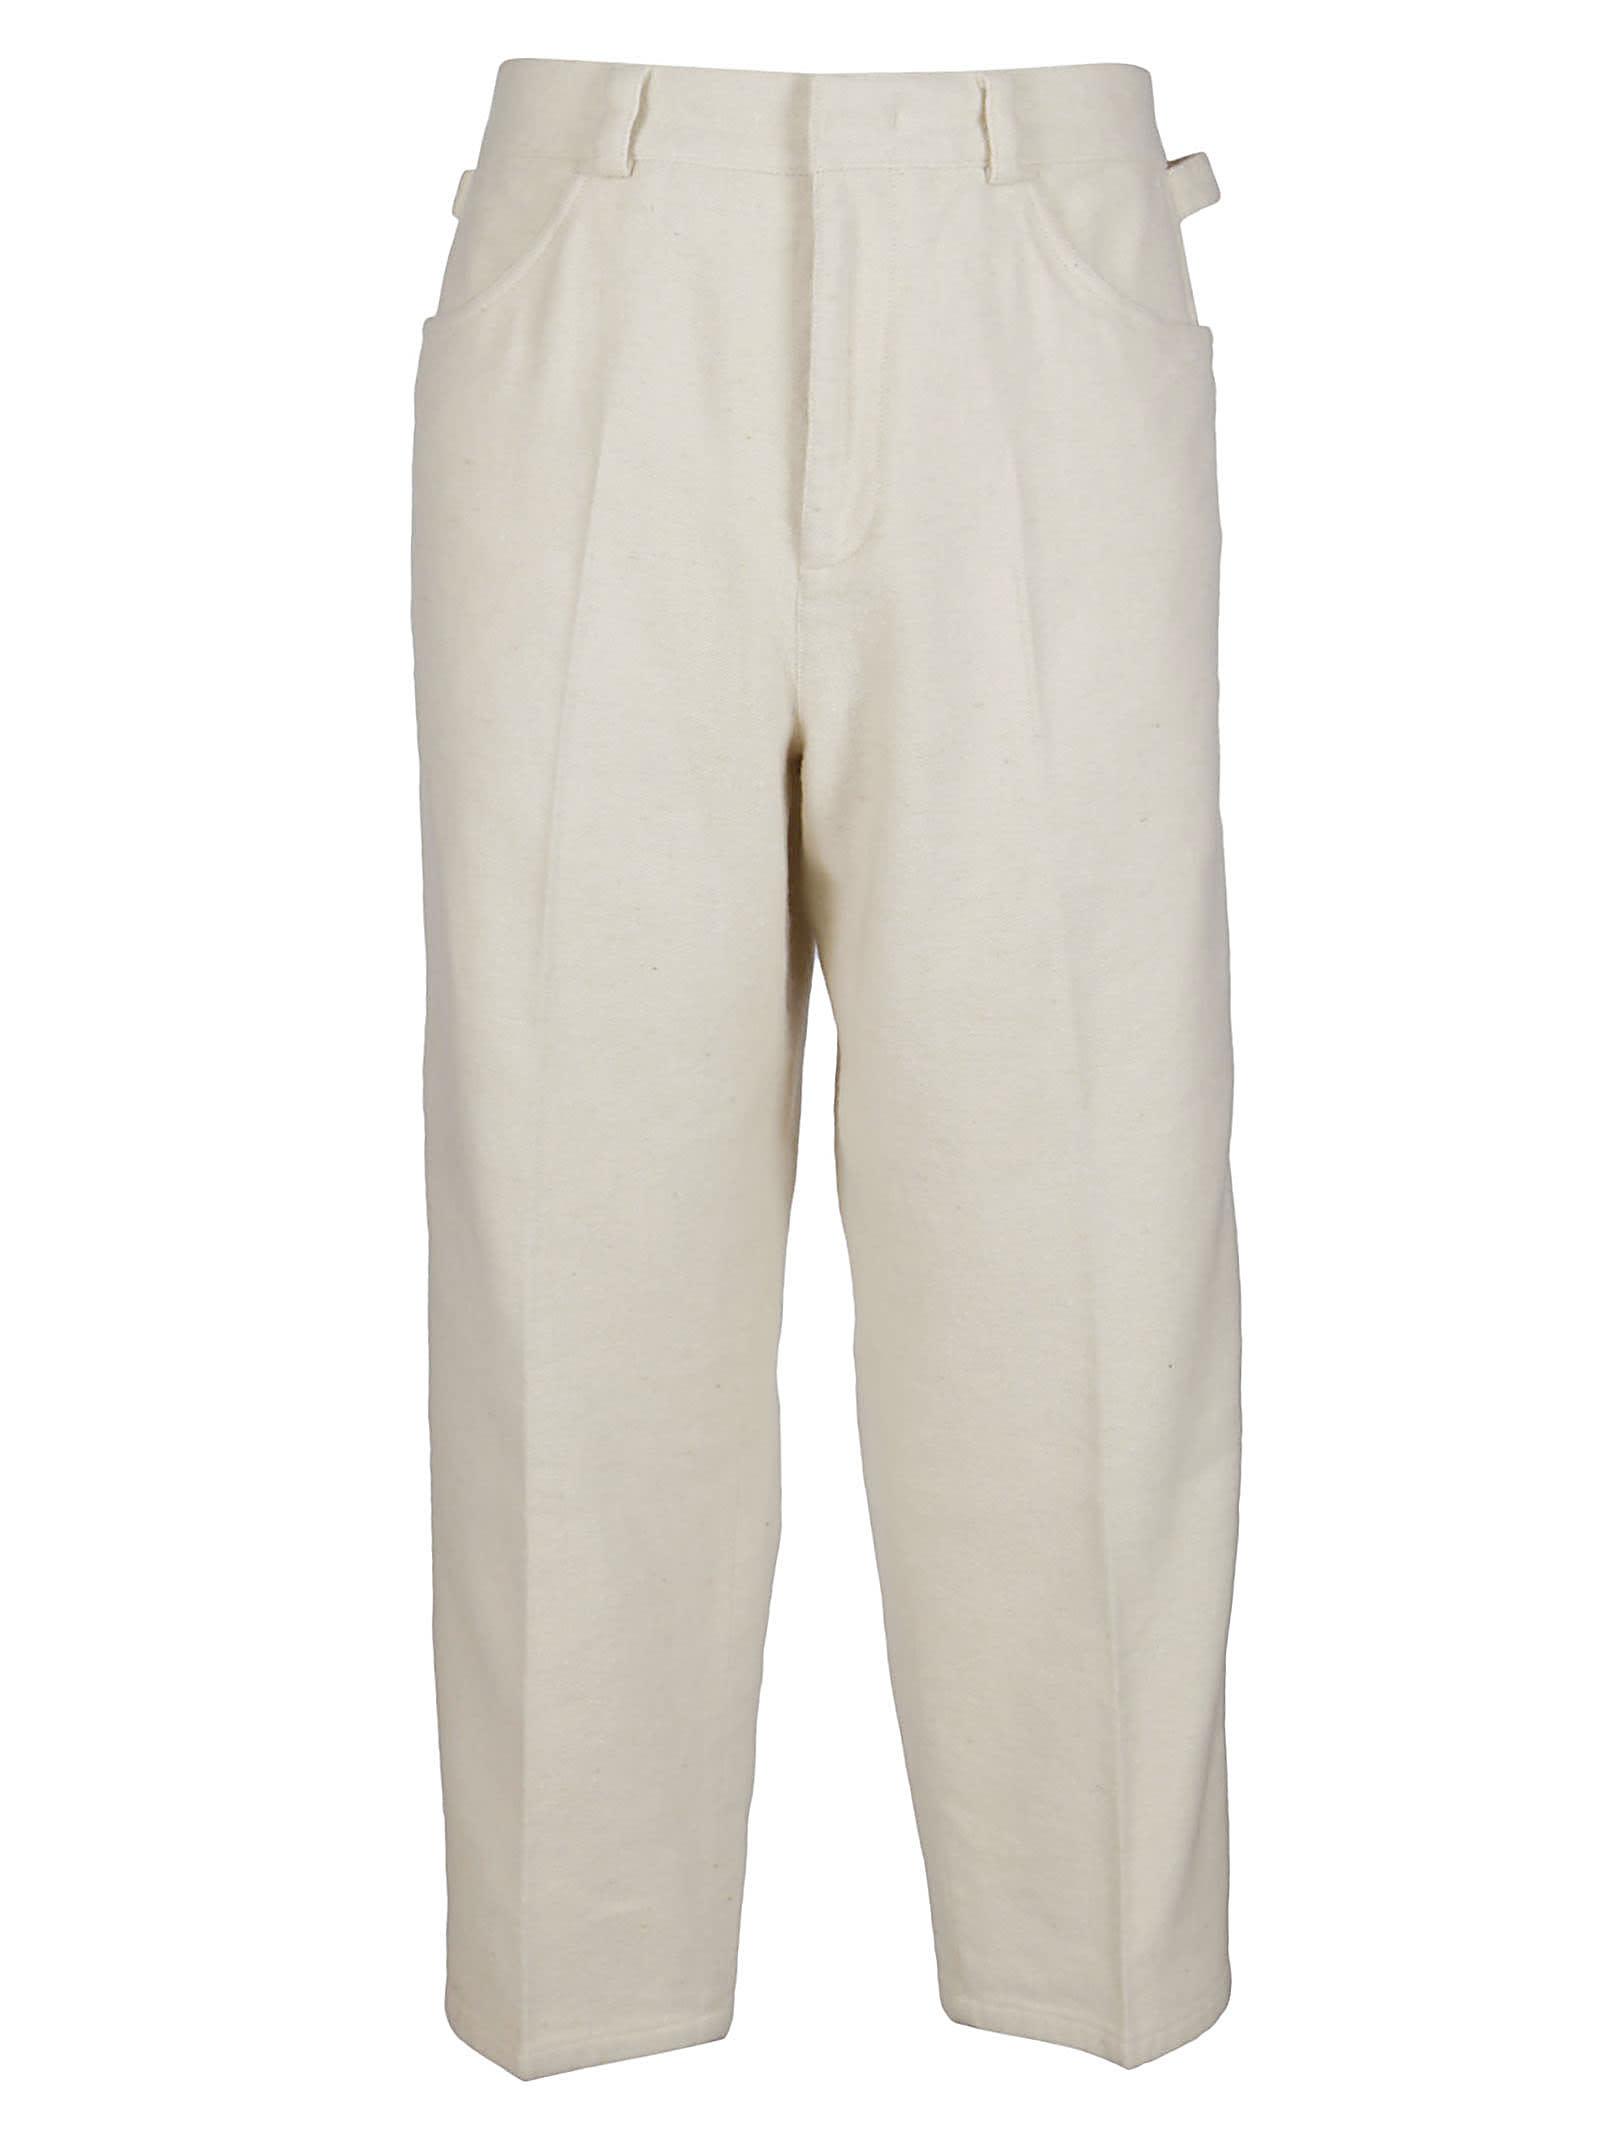 Jil Sander Ivory Wool-blend Trousers